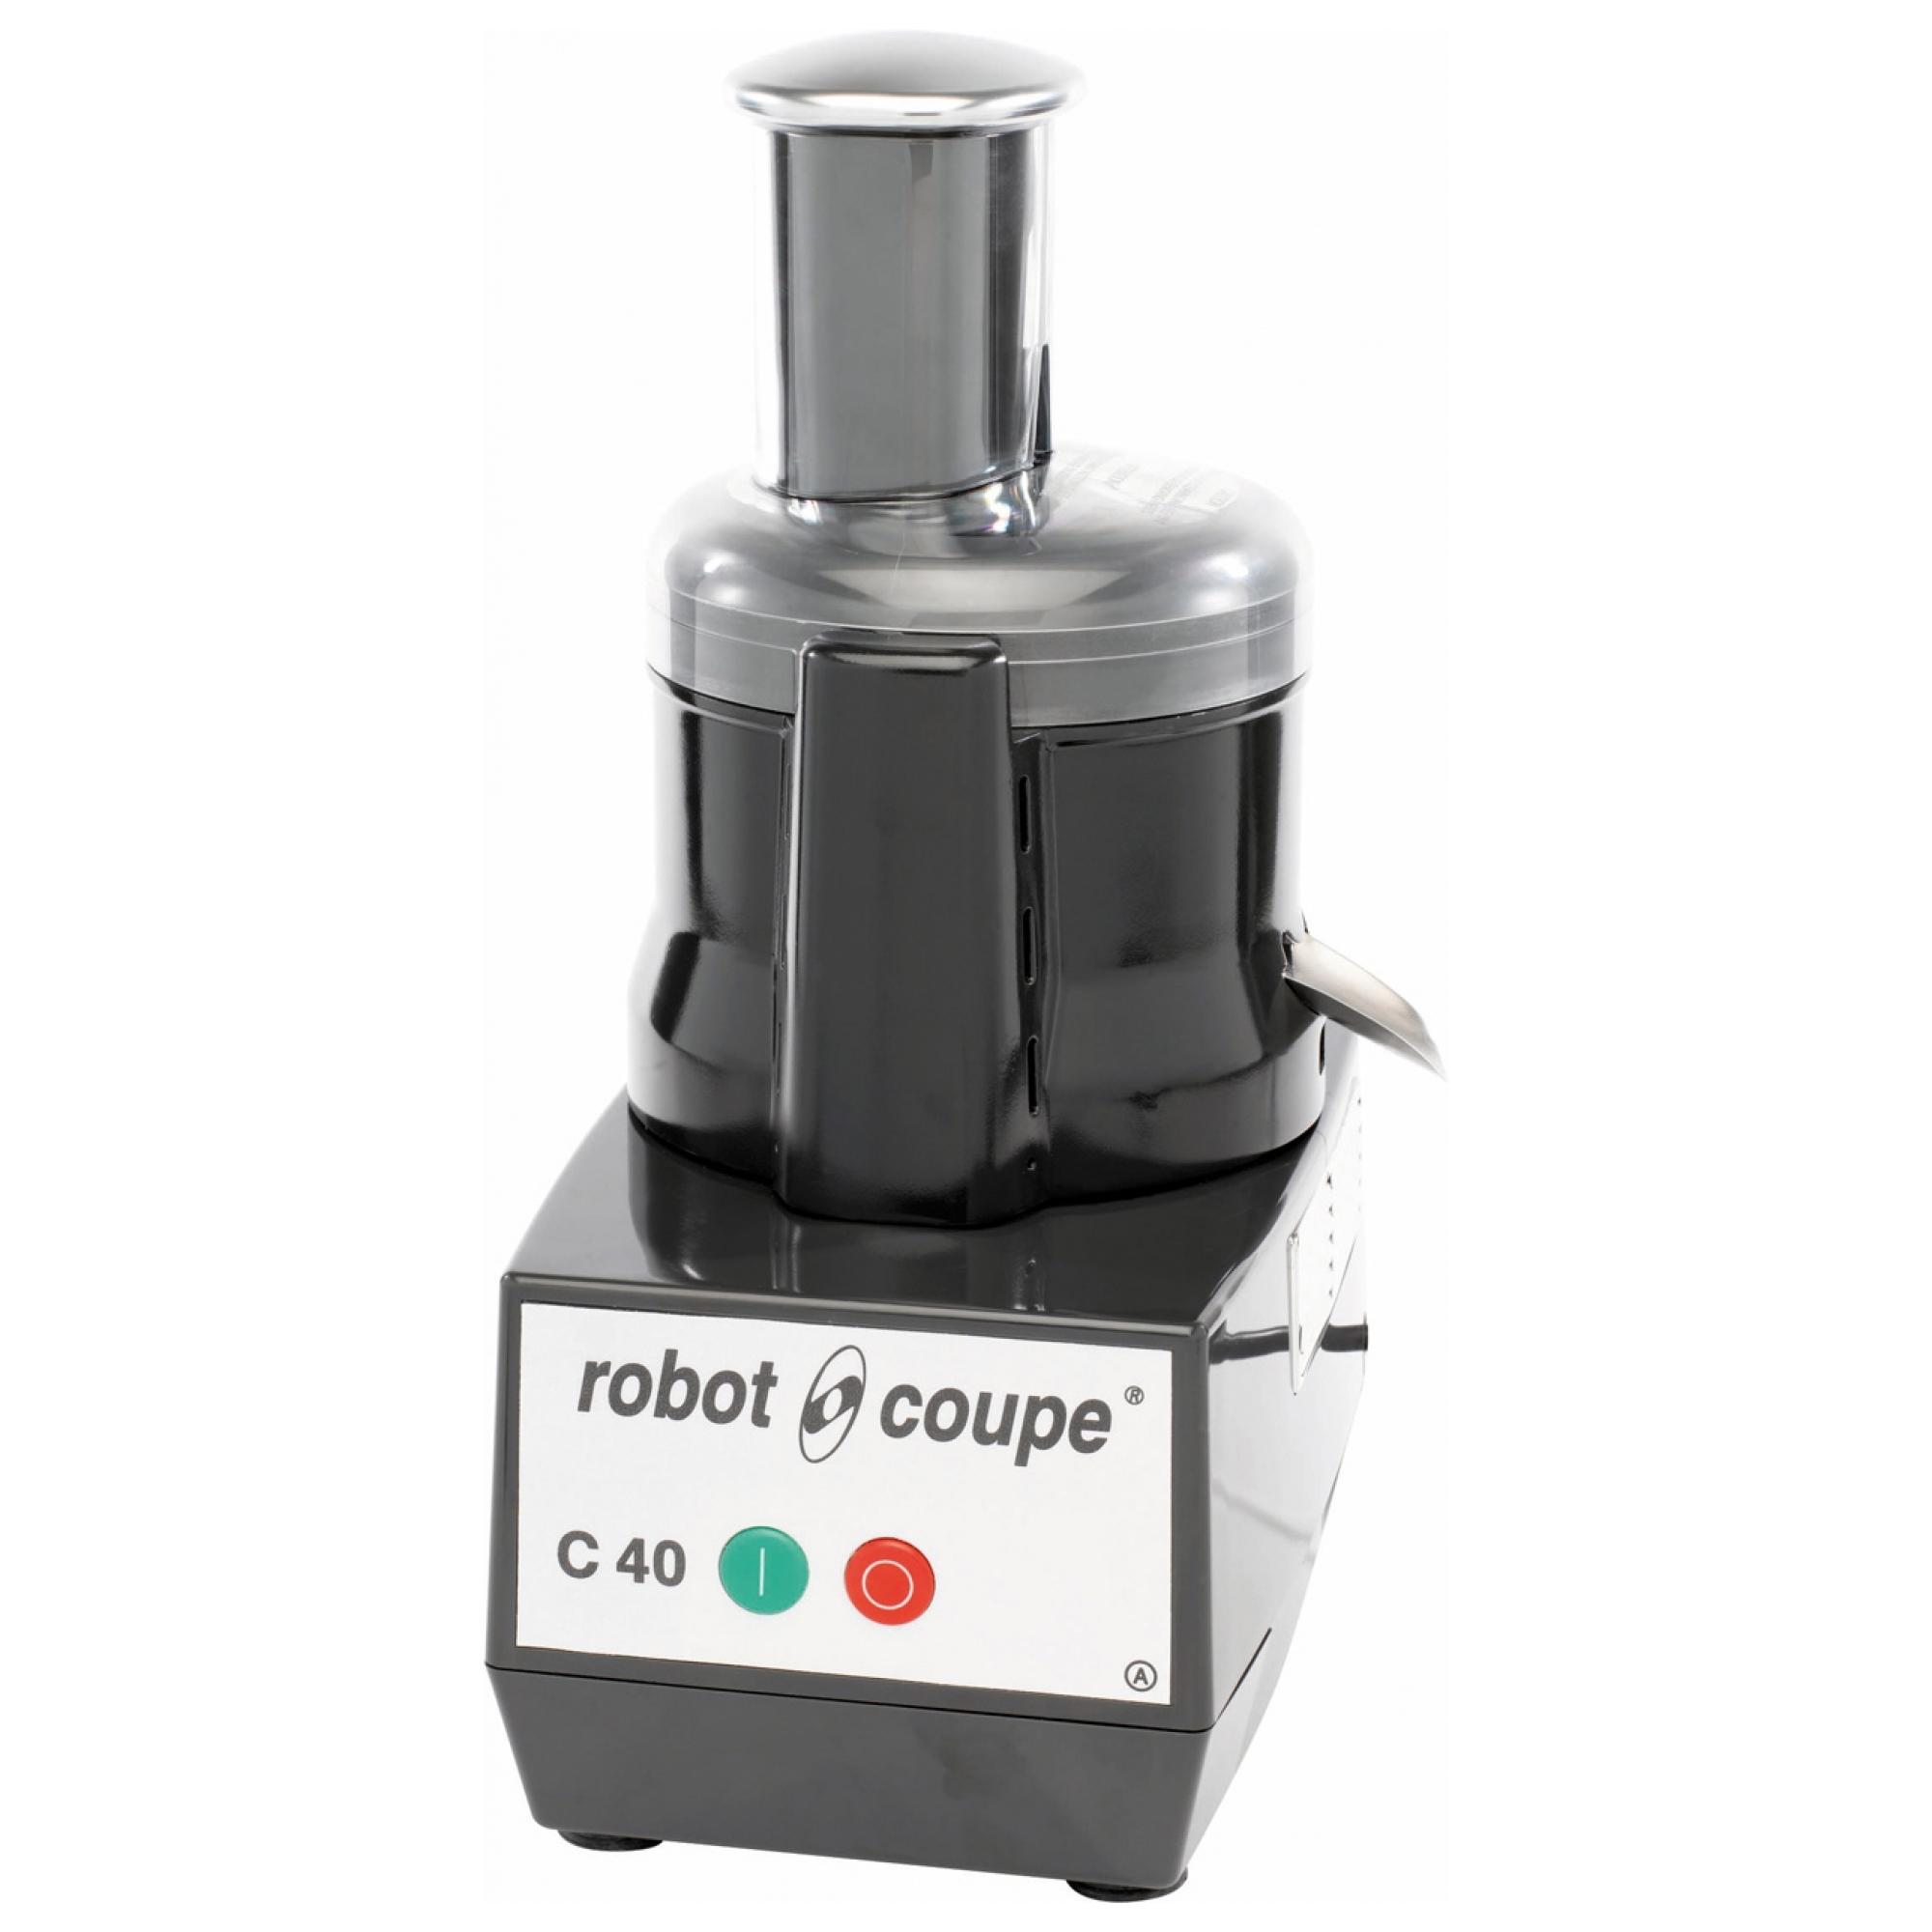 Протирочная машина Robot Coupe C 40 (арт. 55040)